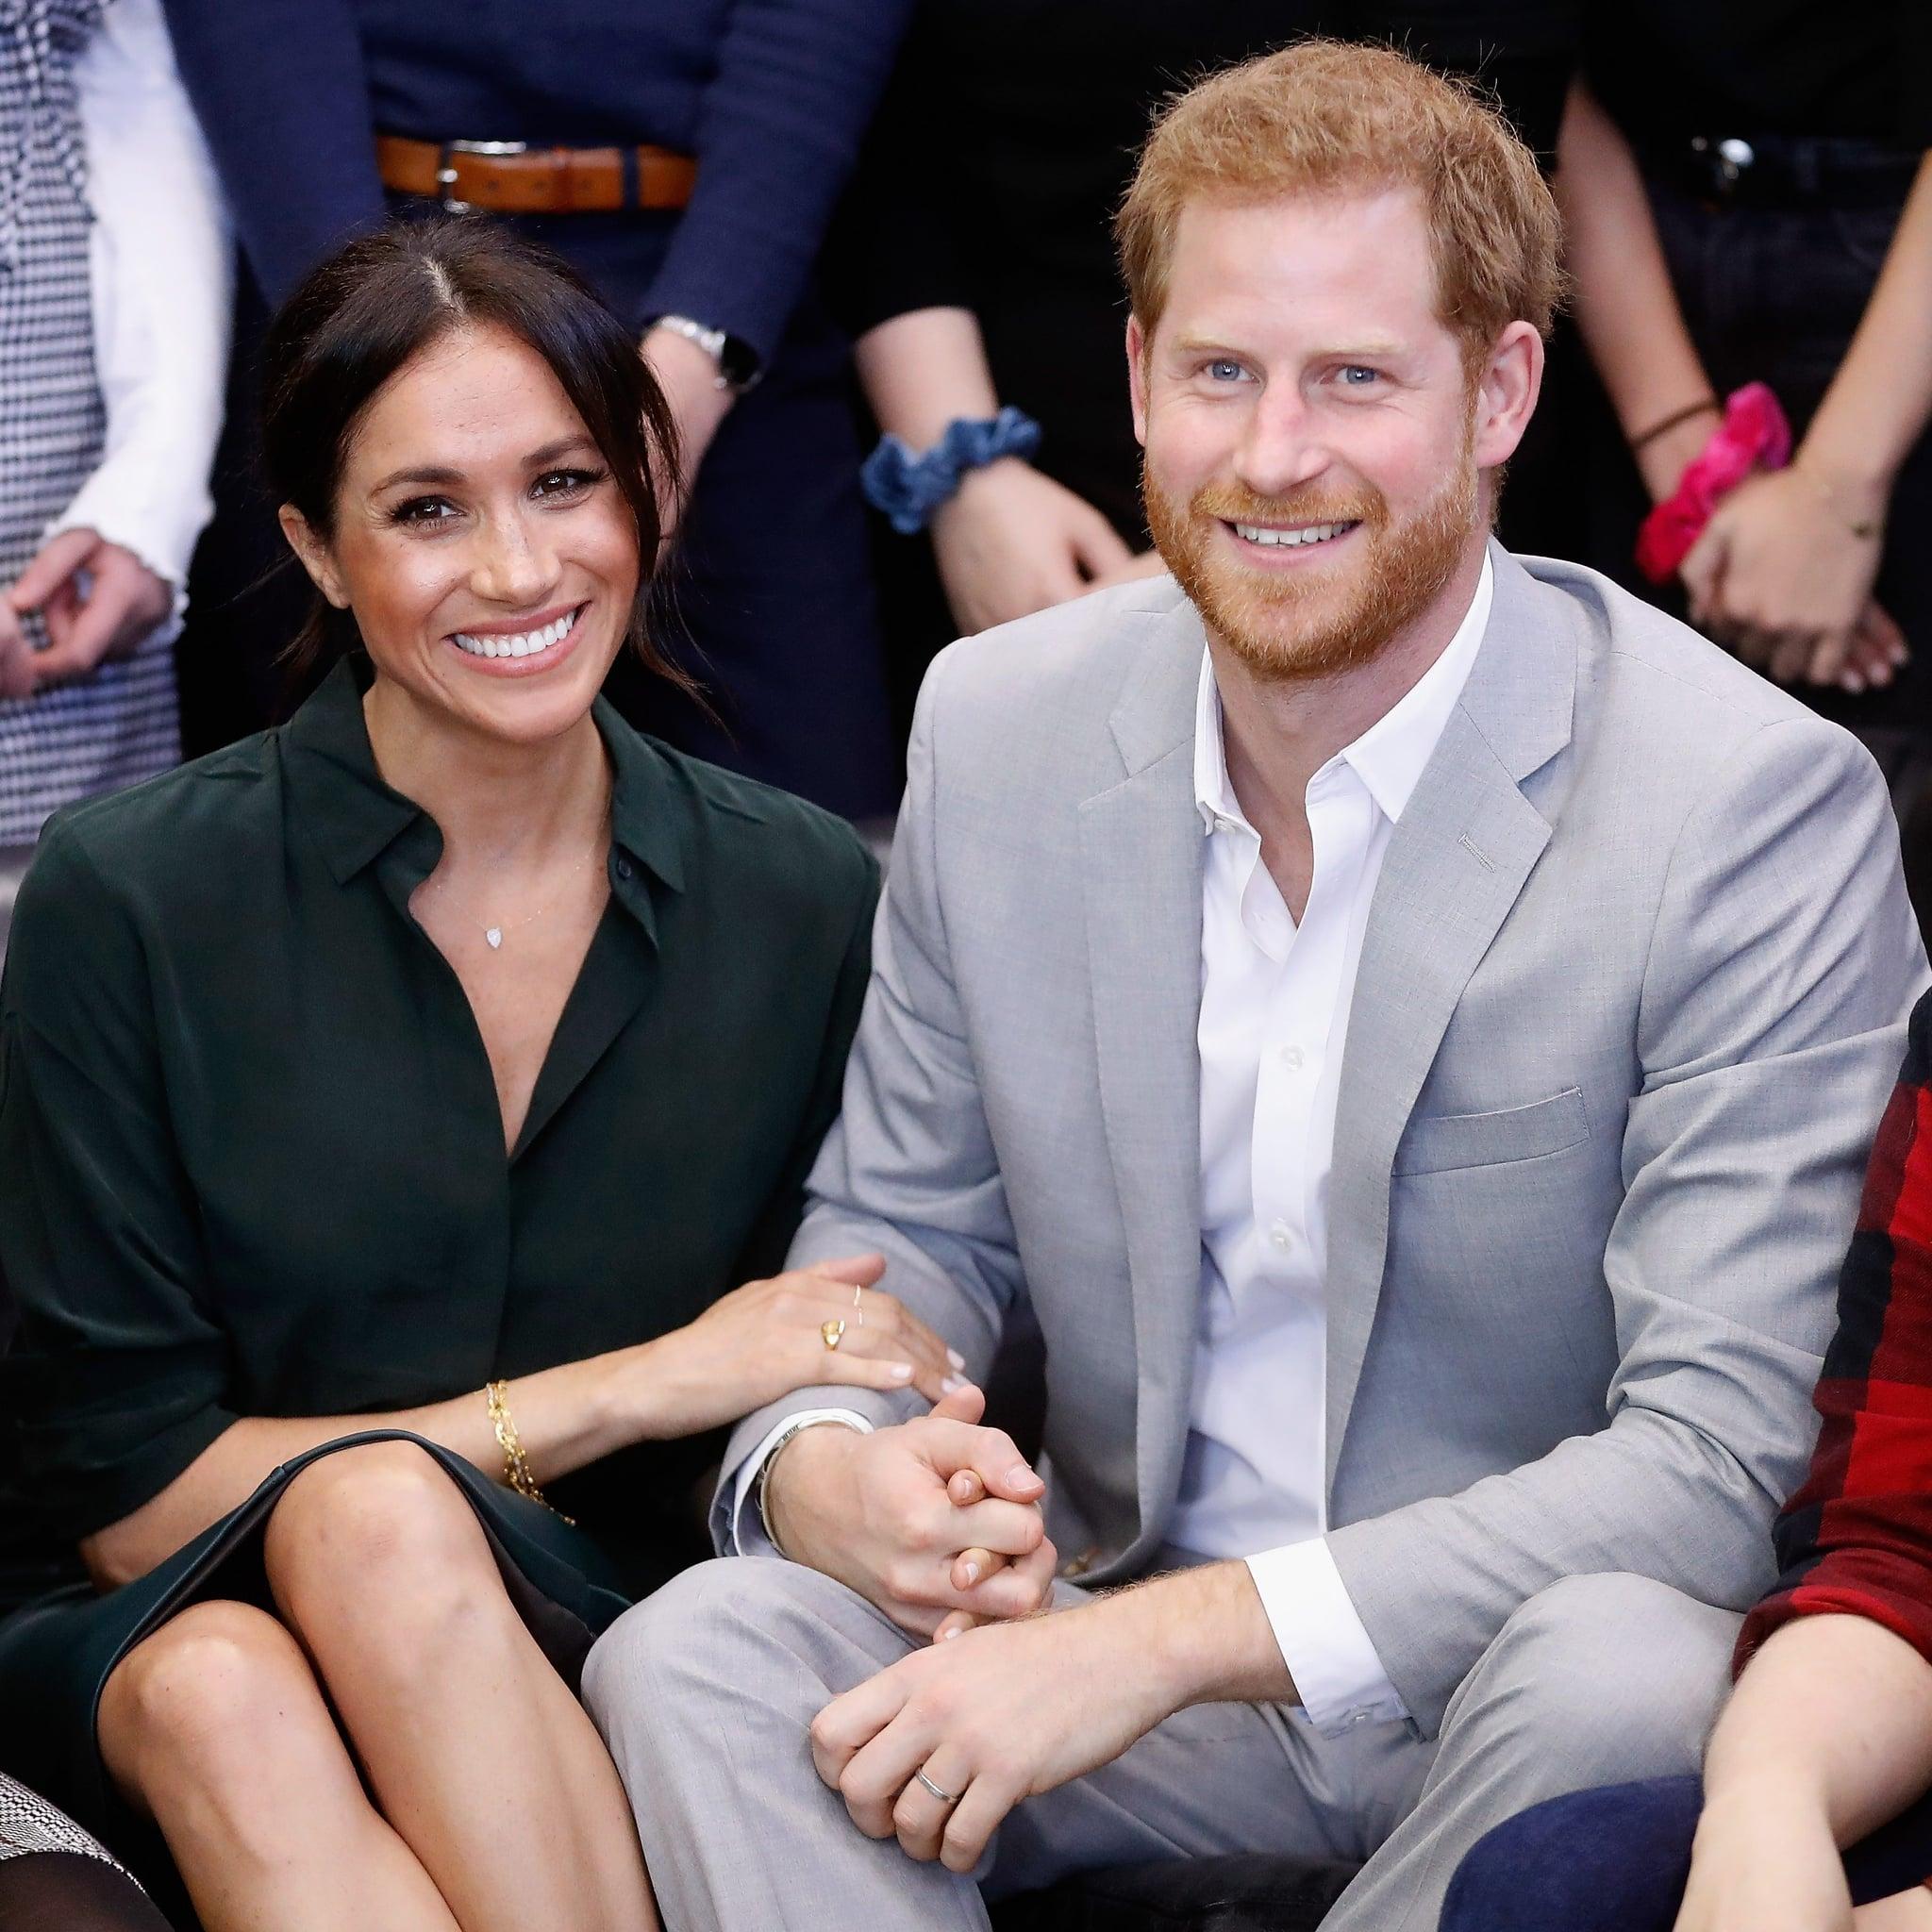 de0e8f078098f Meghan Markle, Prince Harry, Adele at Hubb Community Kitchen | POPSUGAR  Celebrity